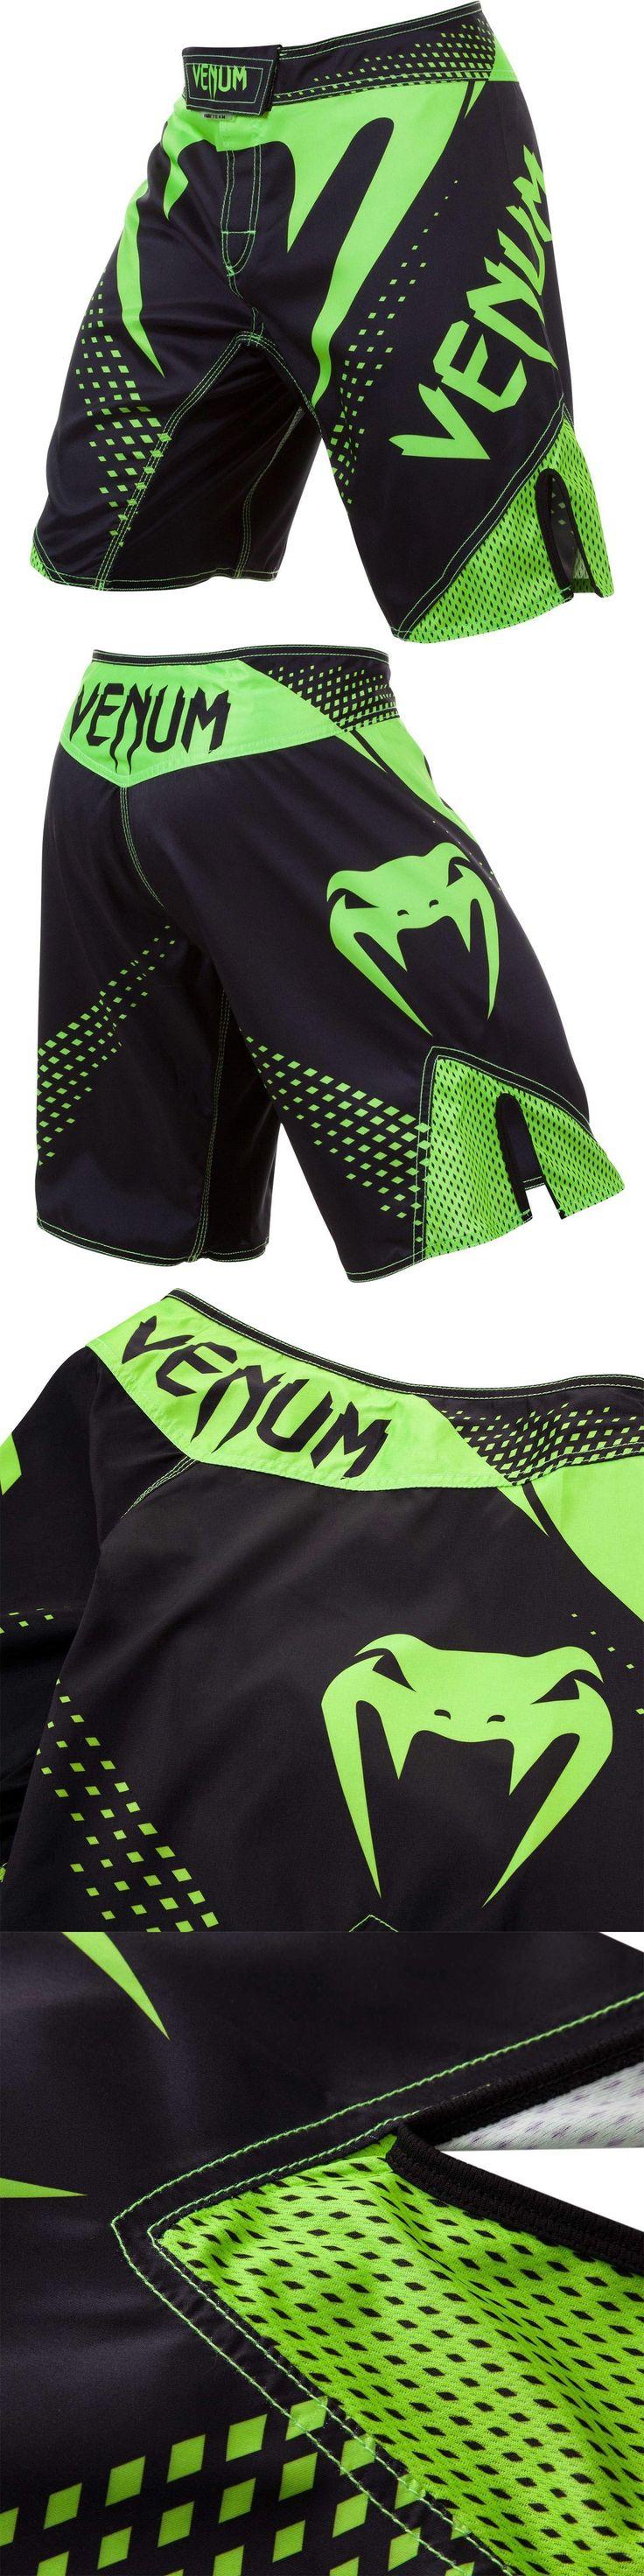 Shorts 73982: Venum Hurricane Fight Shorts - Black Neon Green Mma Bjj -> BUY IT NOW ONLY: $69.99 on eBay!